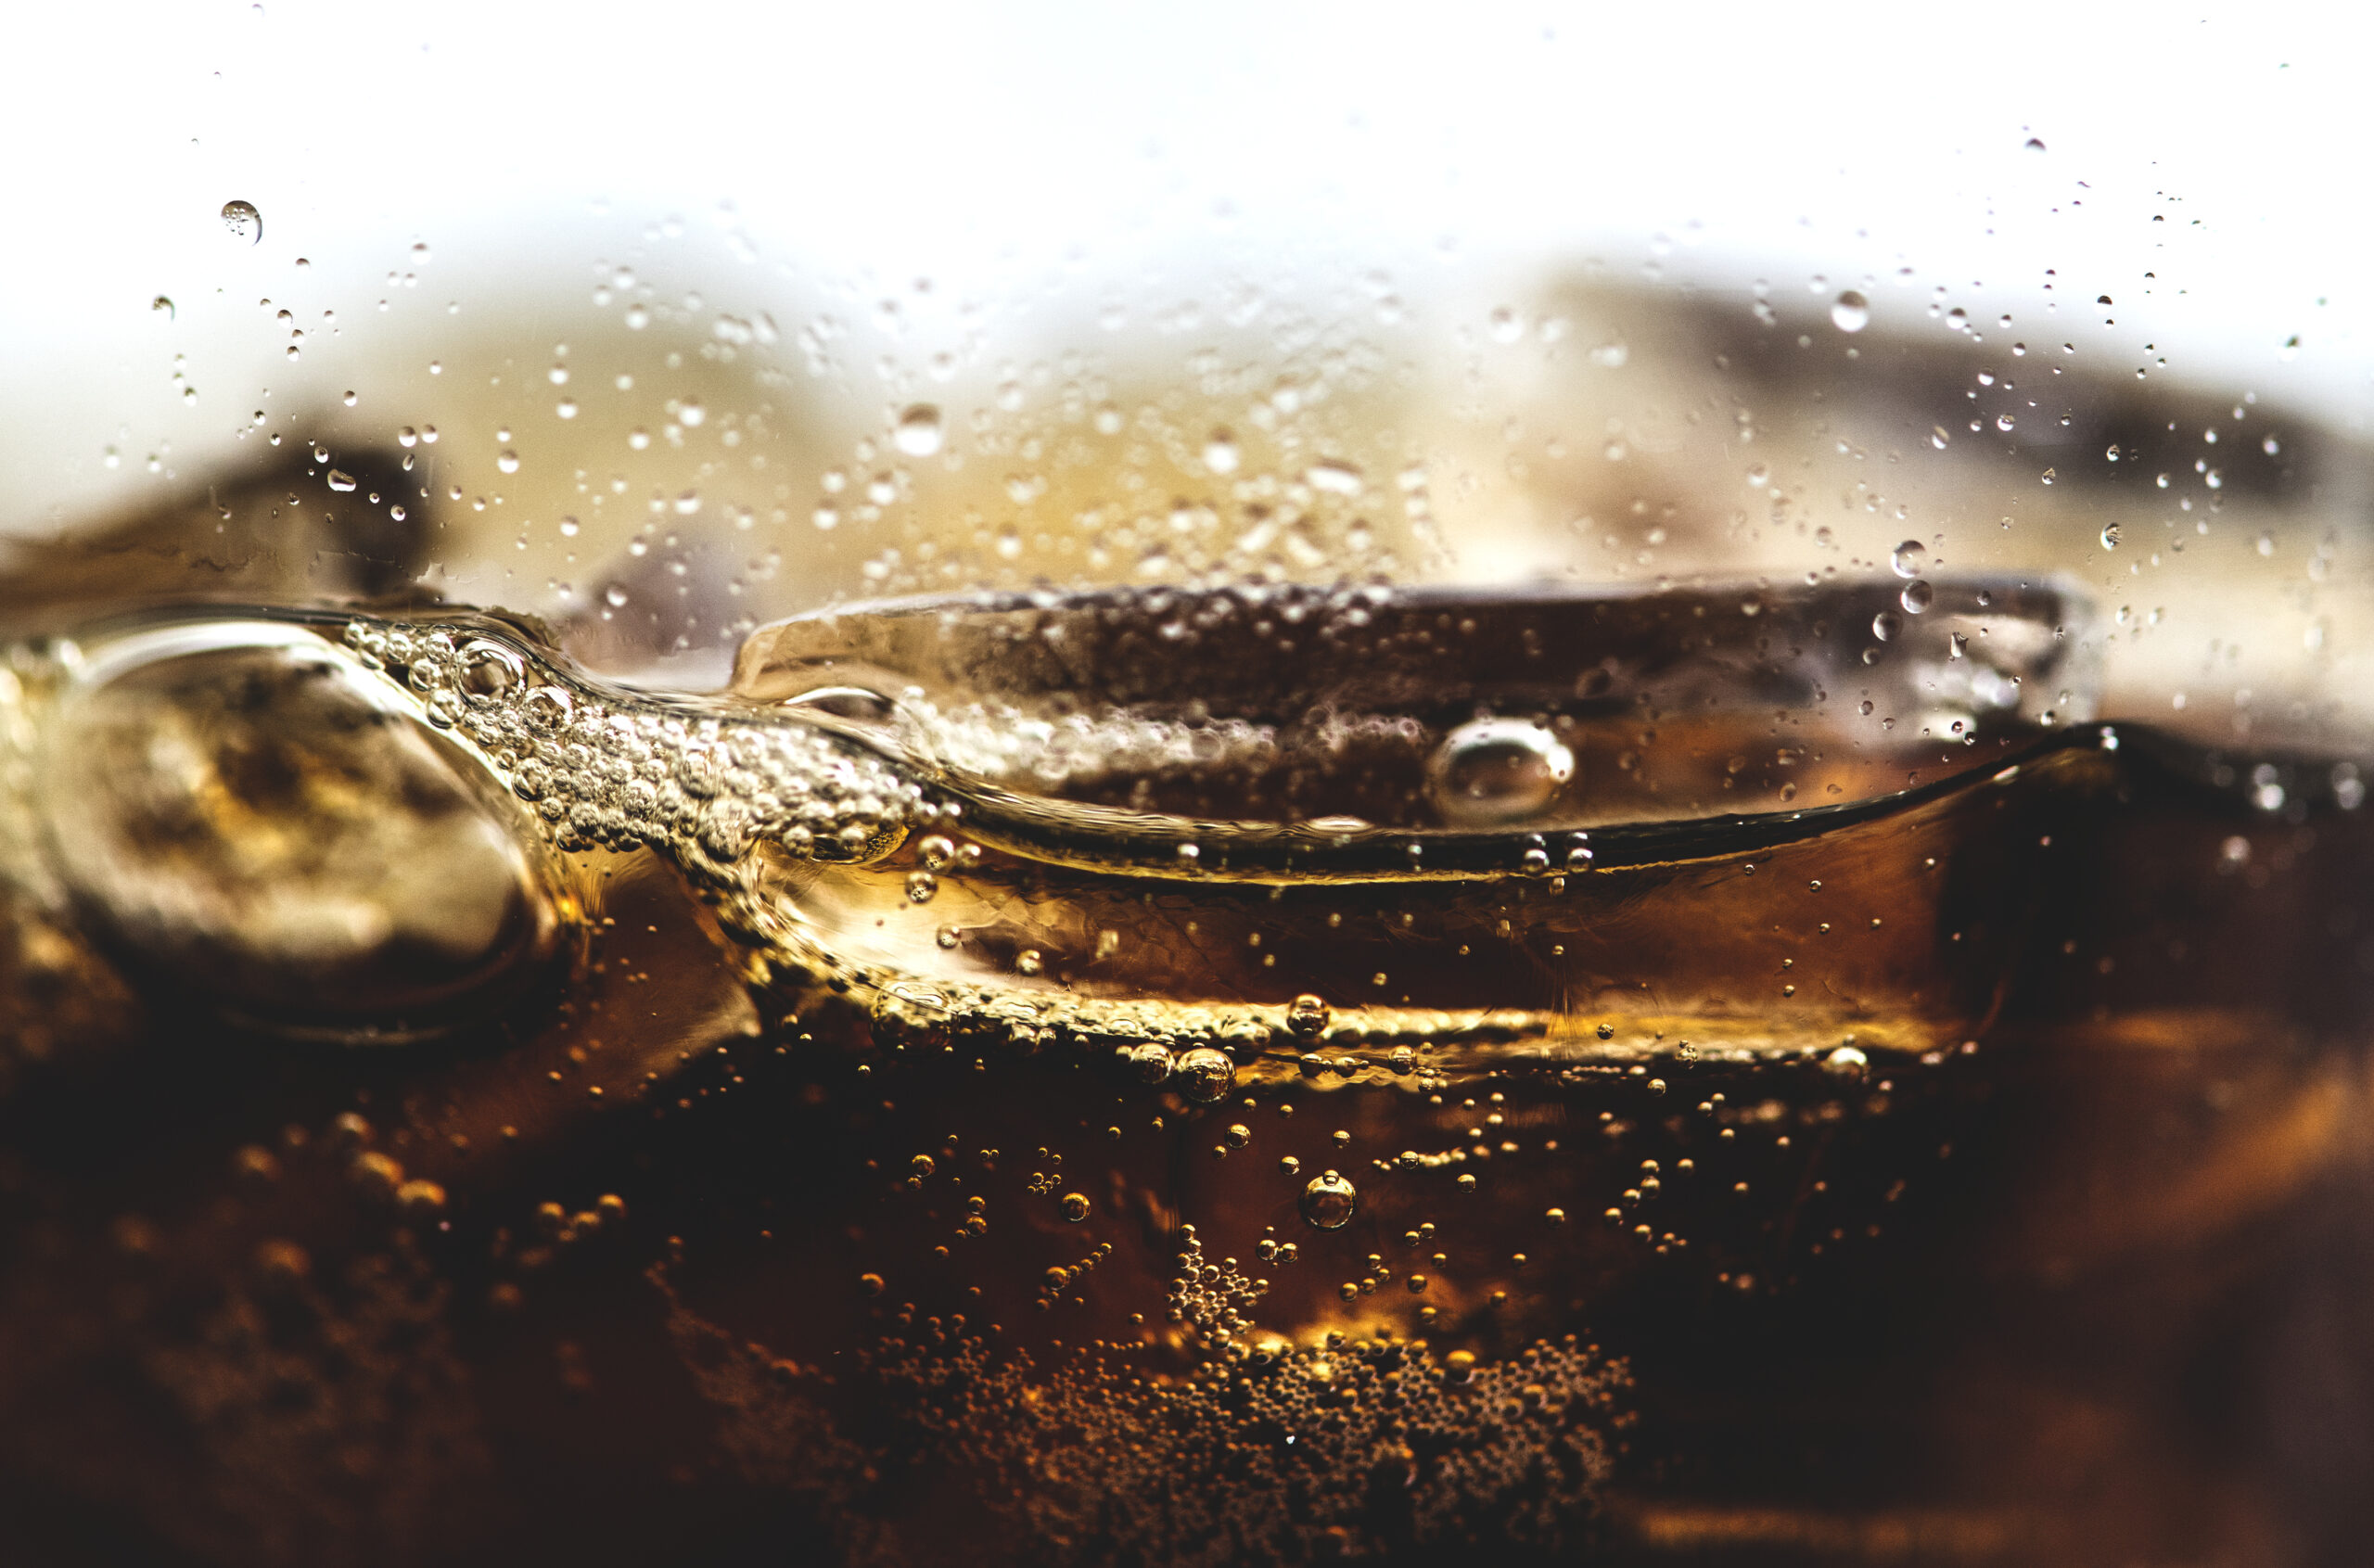 Webinar on Reducing Sugary Drinks